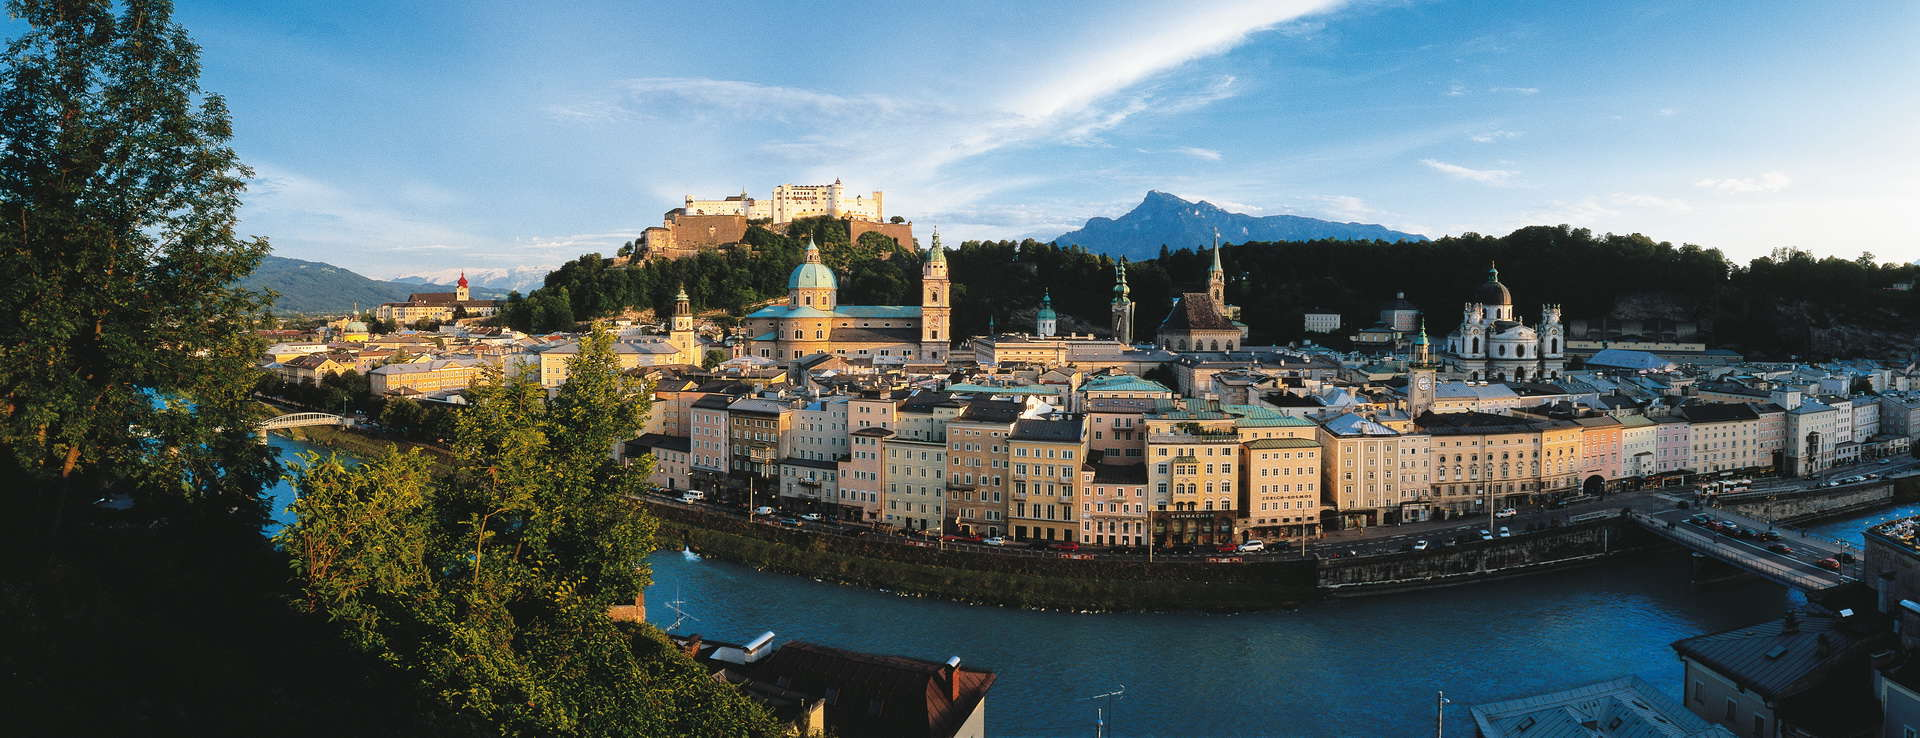 Vy över vackra Salzburg Österrike